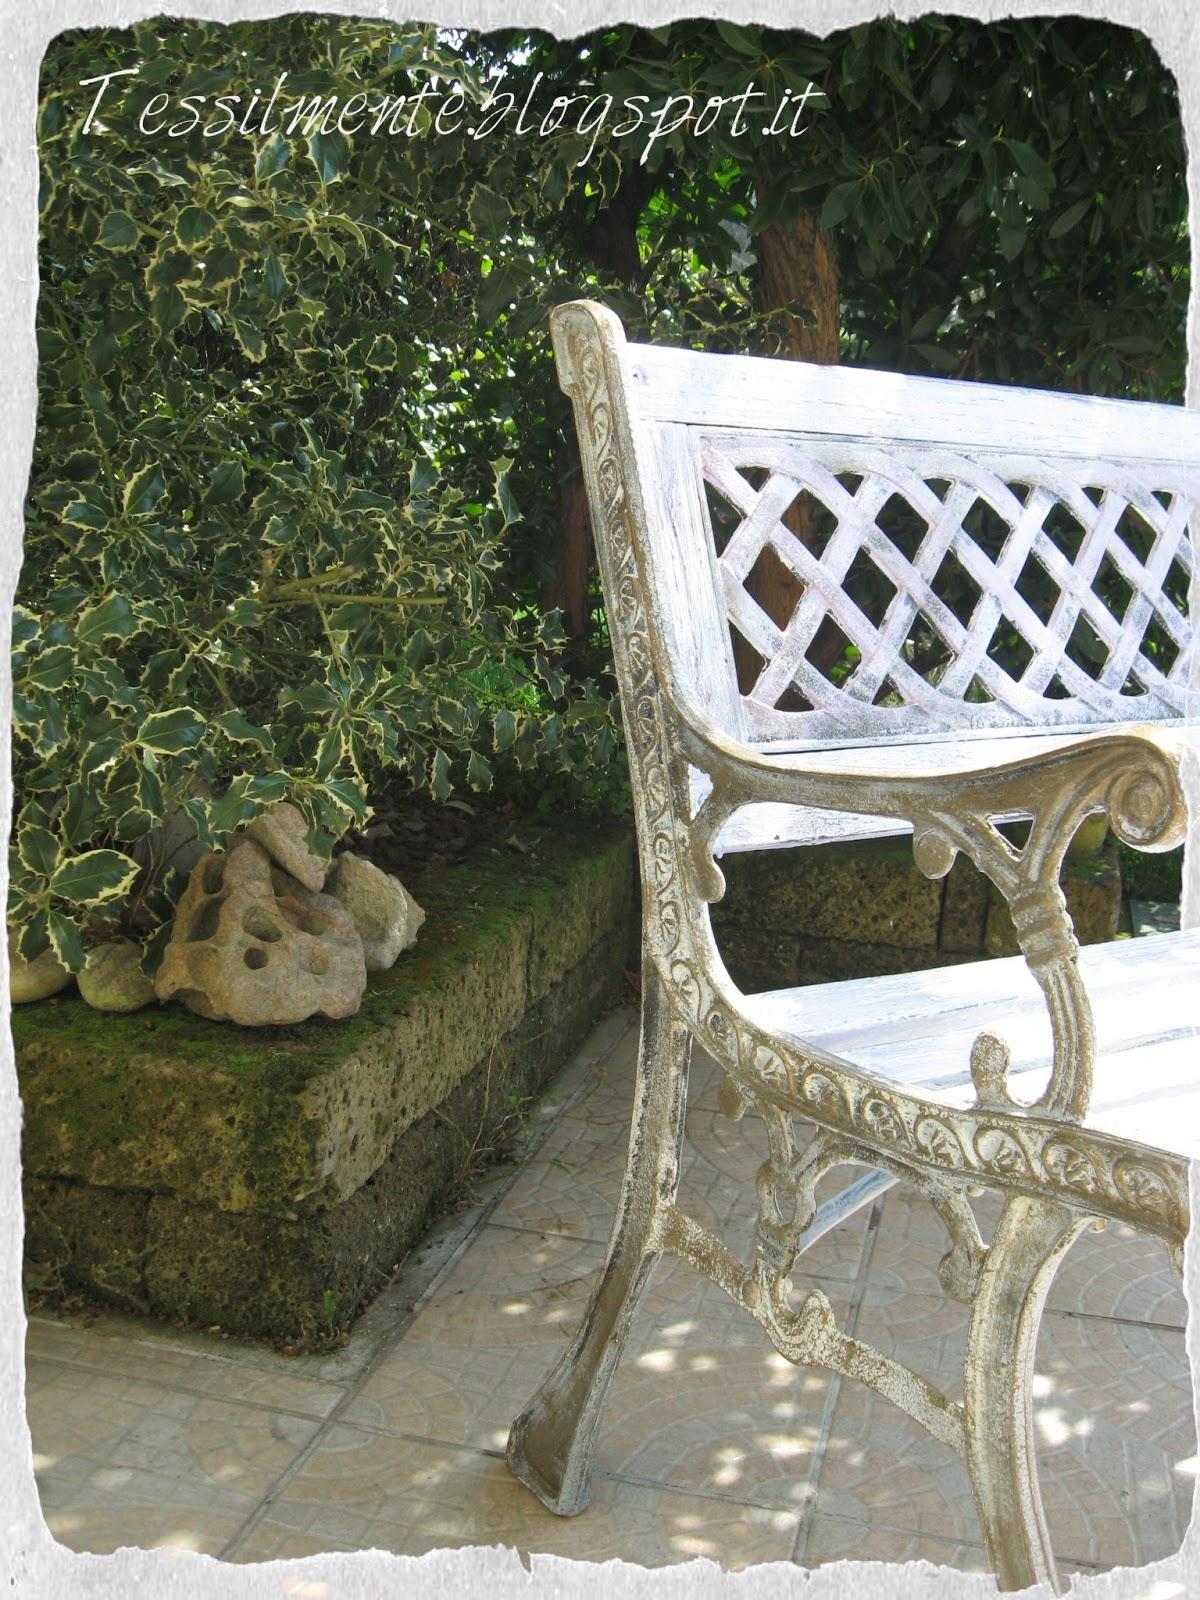 Tessil mente bottega creativa panchina shabby chic in - Shabby chic giardino ...